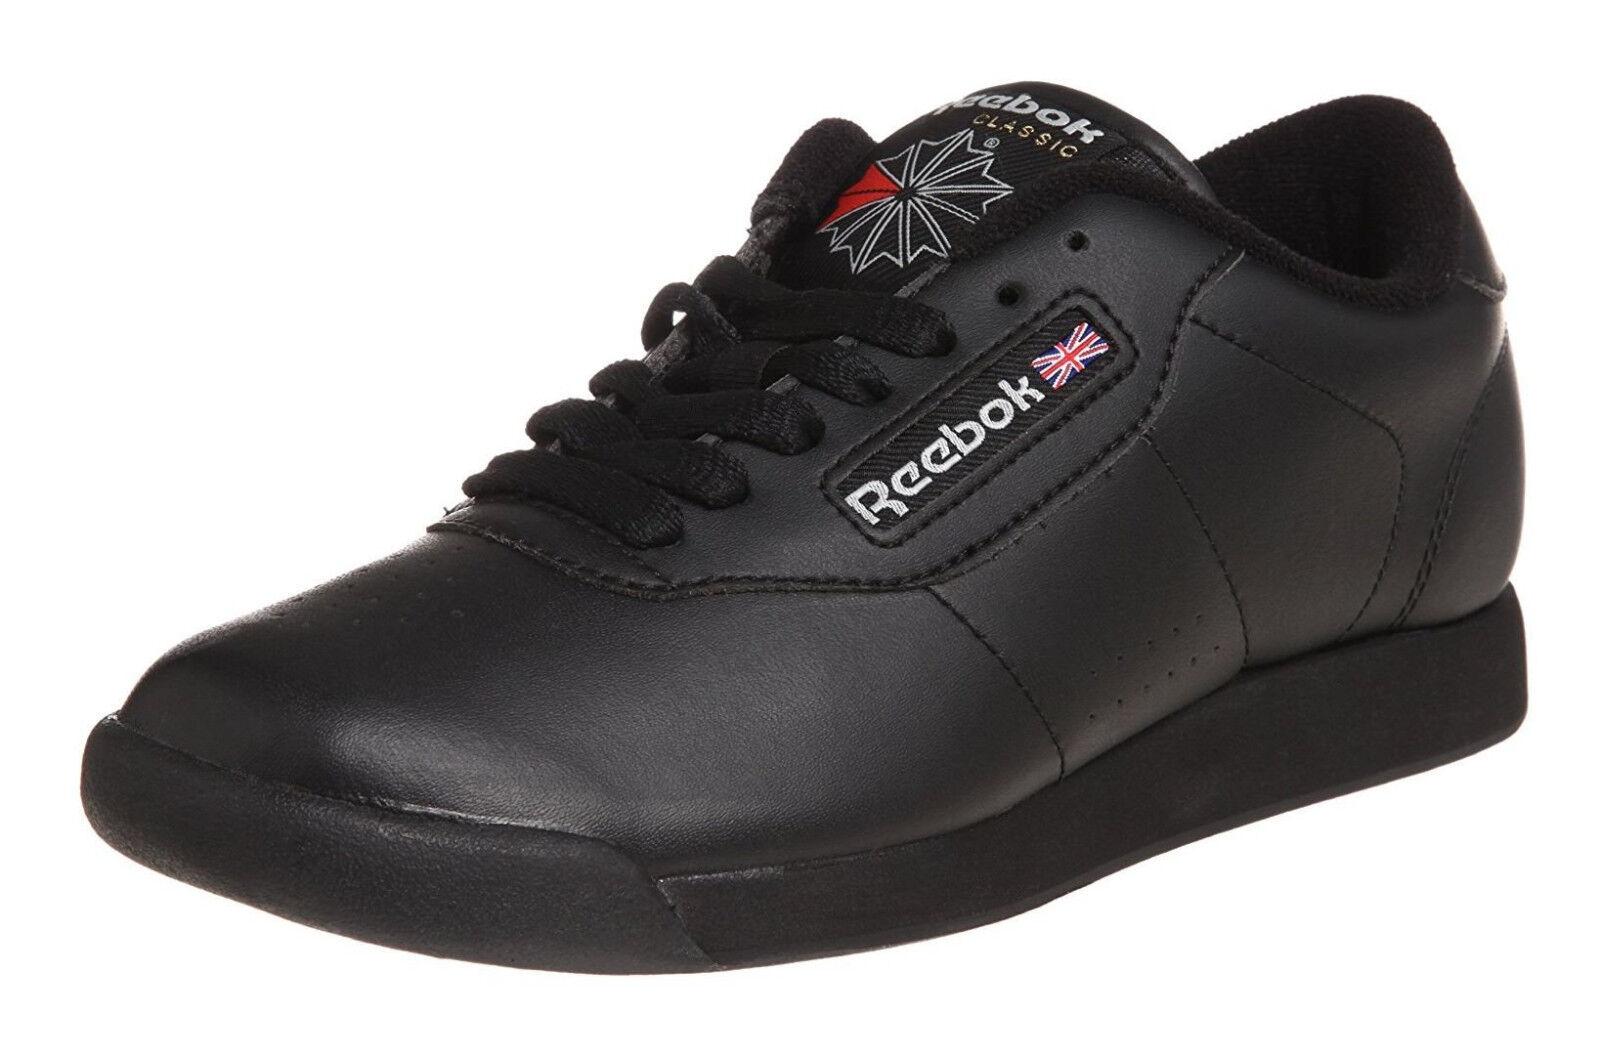 Reebok Classique Princesse Noir Femmes Courir Chaussures de Tennis